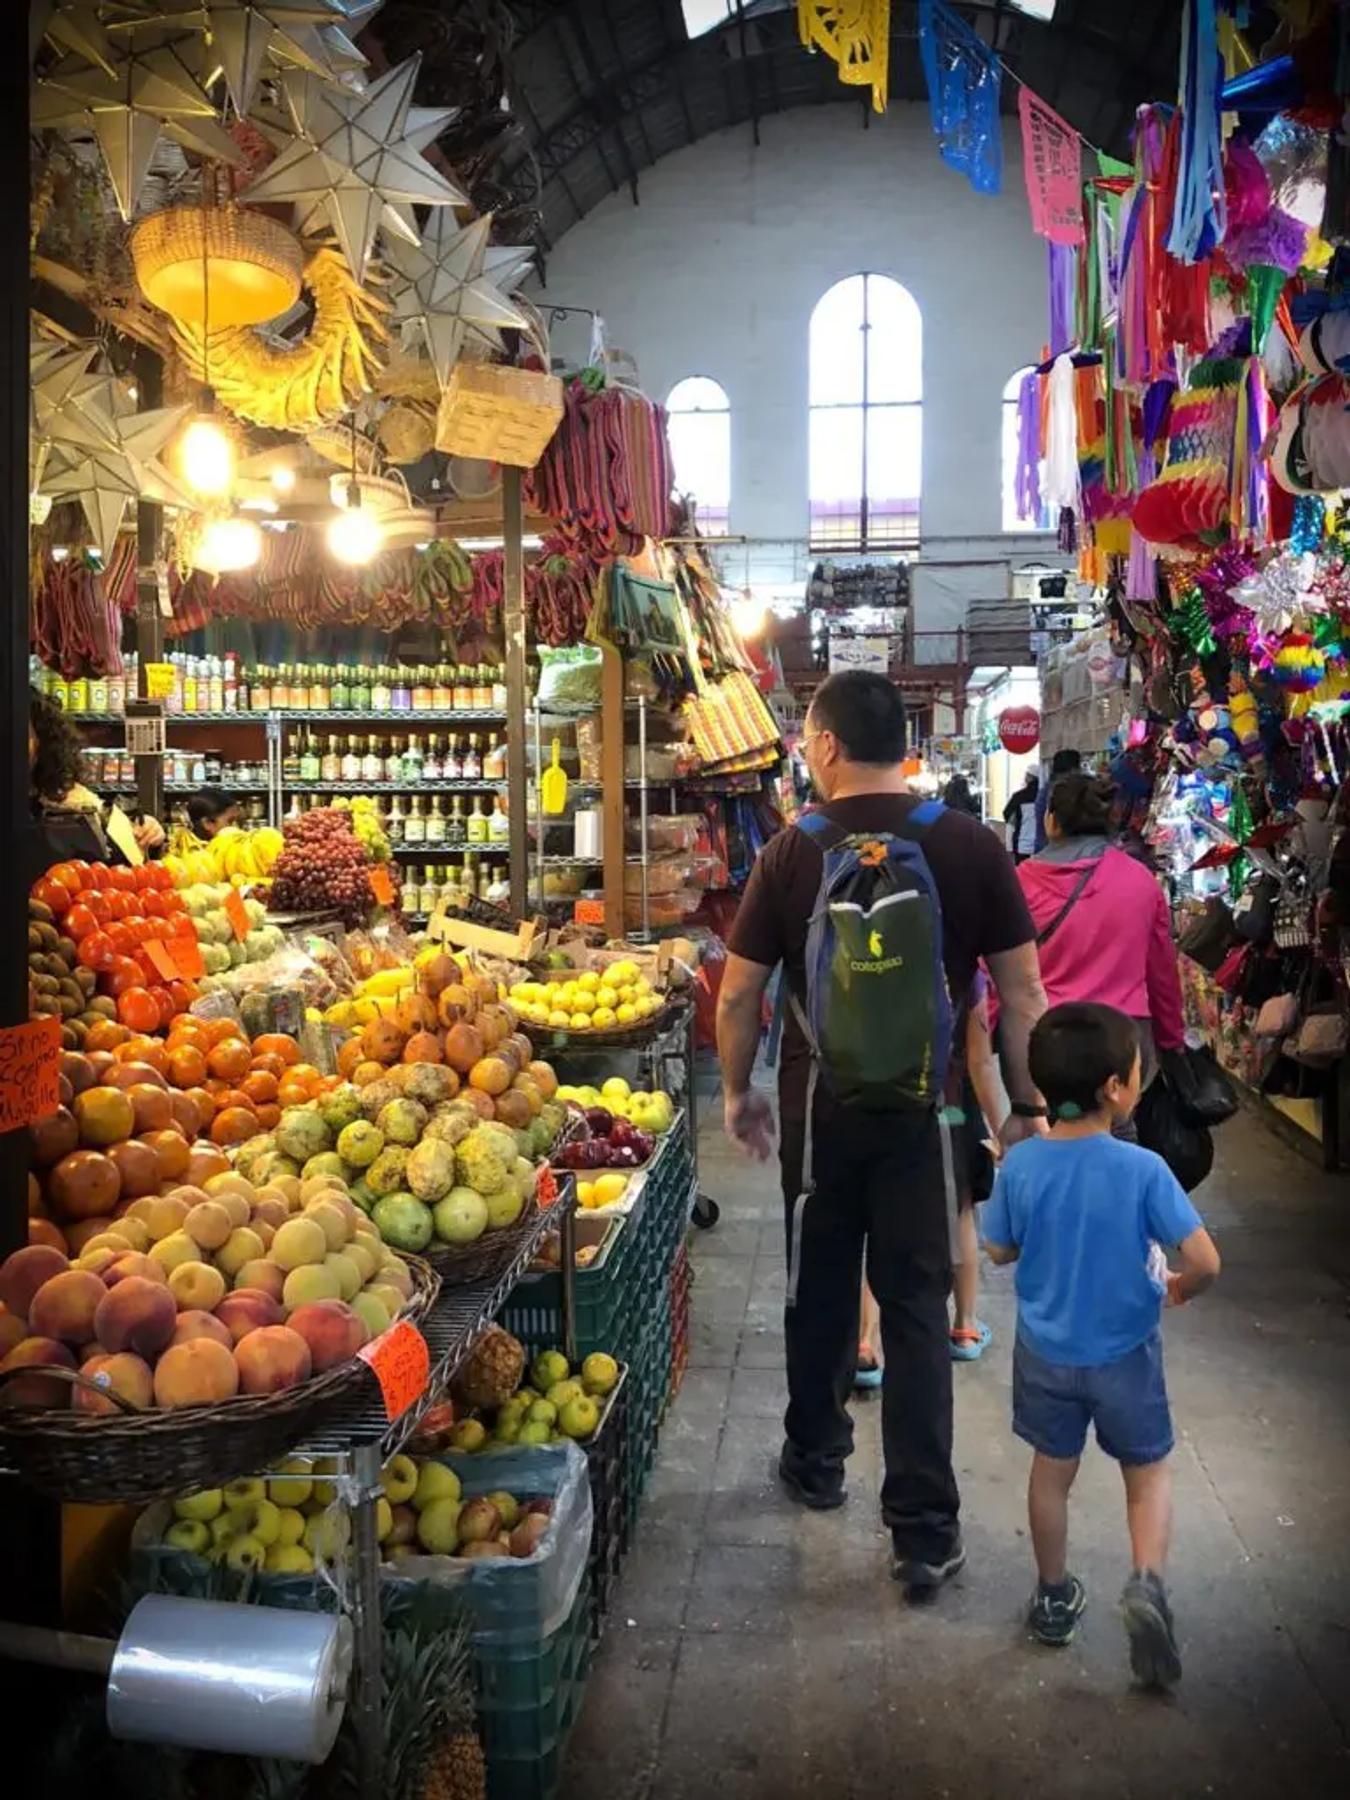 Visiting a local market in Guanajuato, Mexico (December 2018)